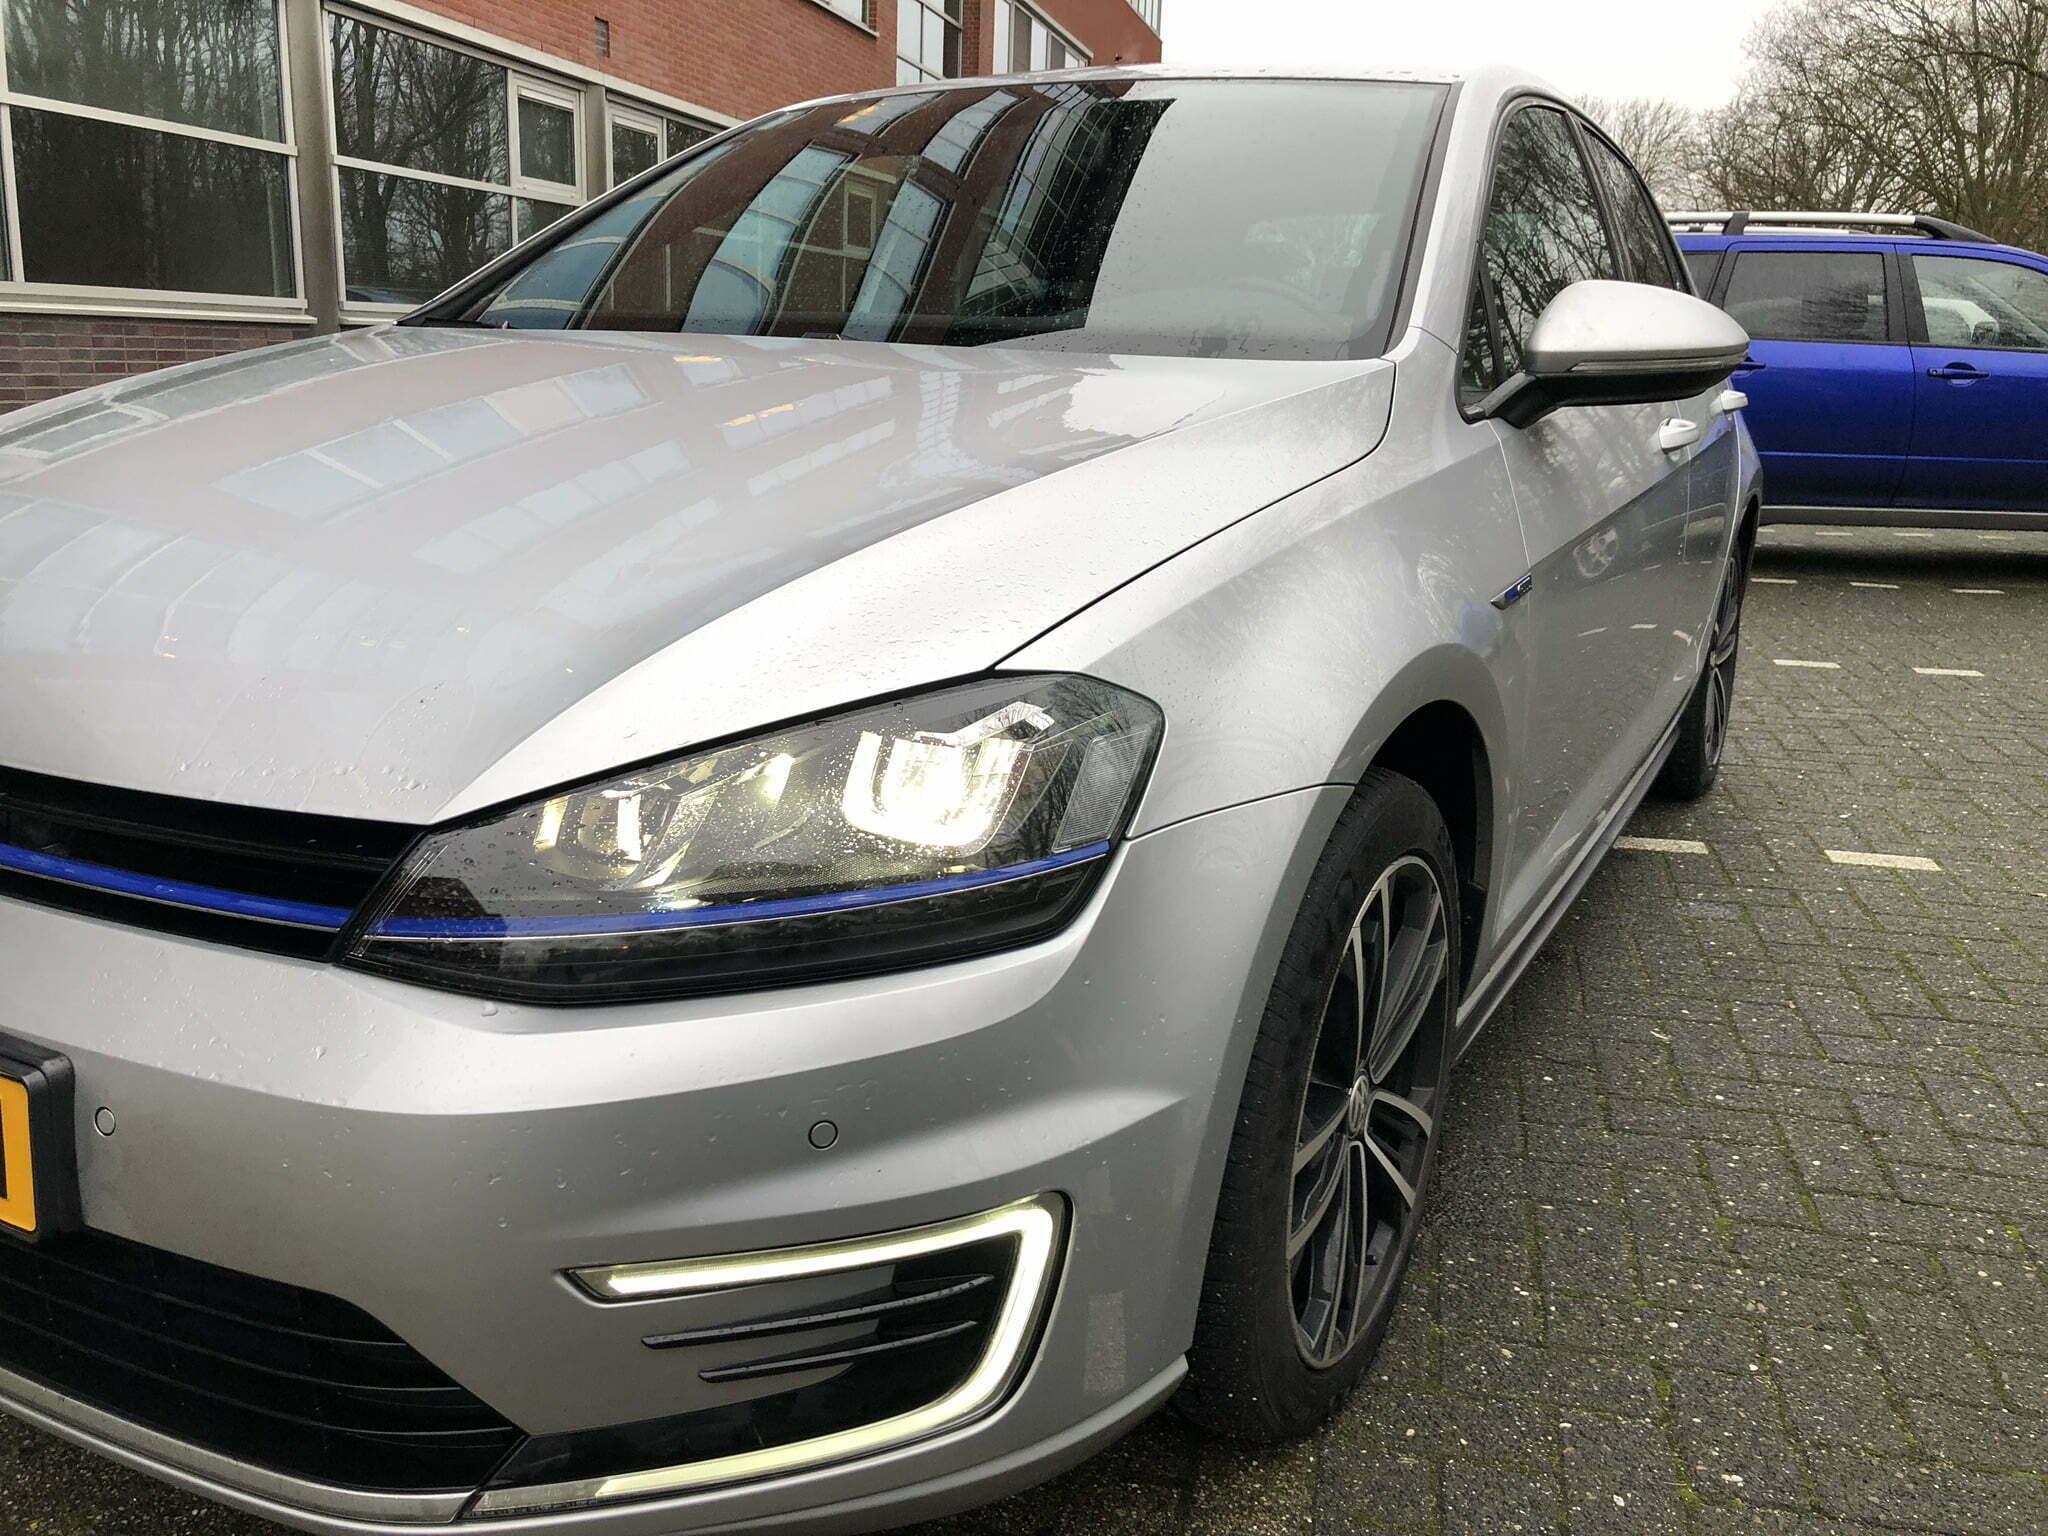 Volkswagen Golf GTE 7% bijtelling Occasion Lease - LeaseRoute13